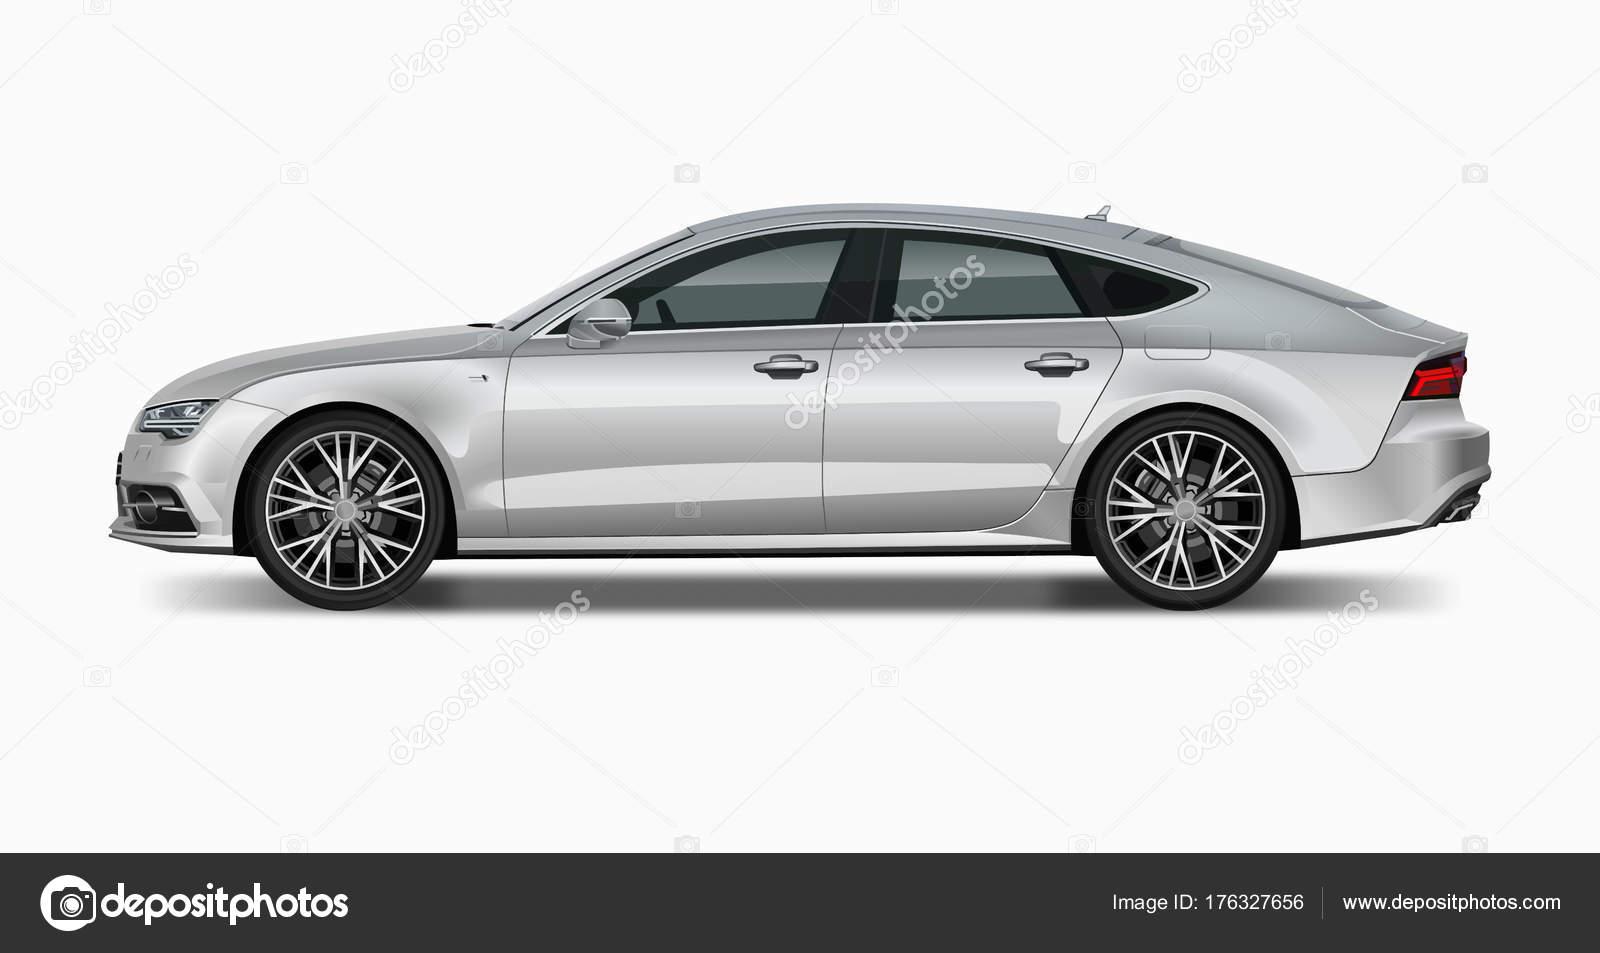 Audi Silver Side View Elit Car Stock Vector AlexKlik - Audi car vector